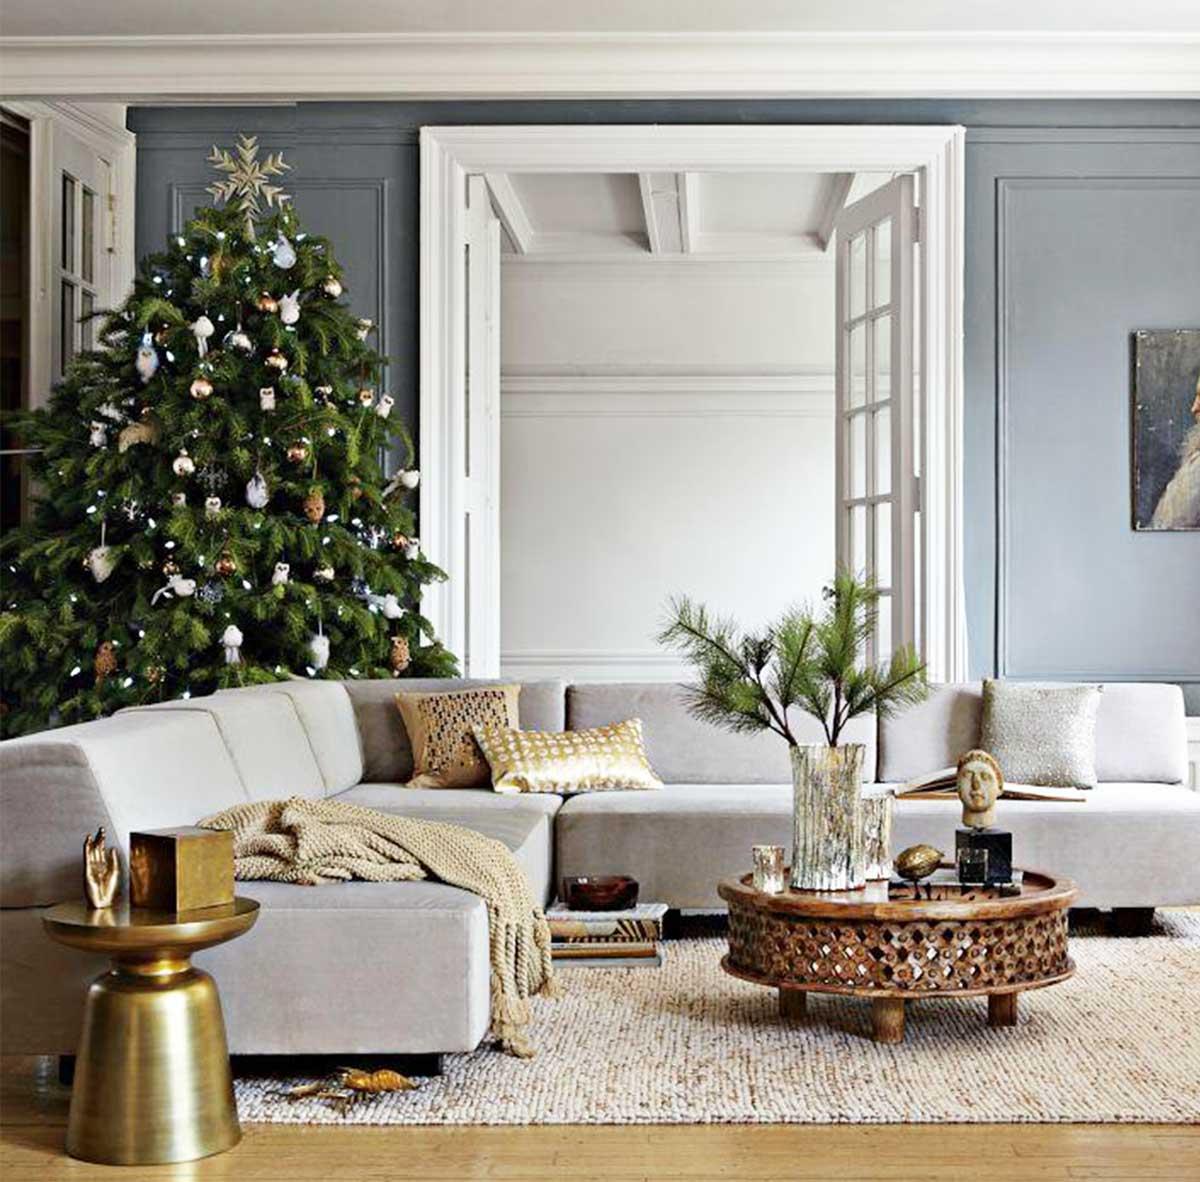 8 Inspirasi Dekorasi Hunian Sambut Hari Raya Natal